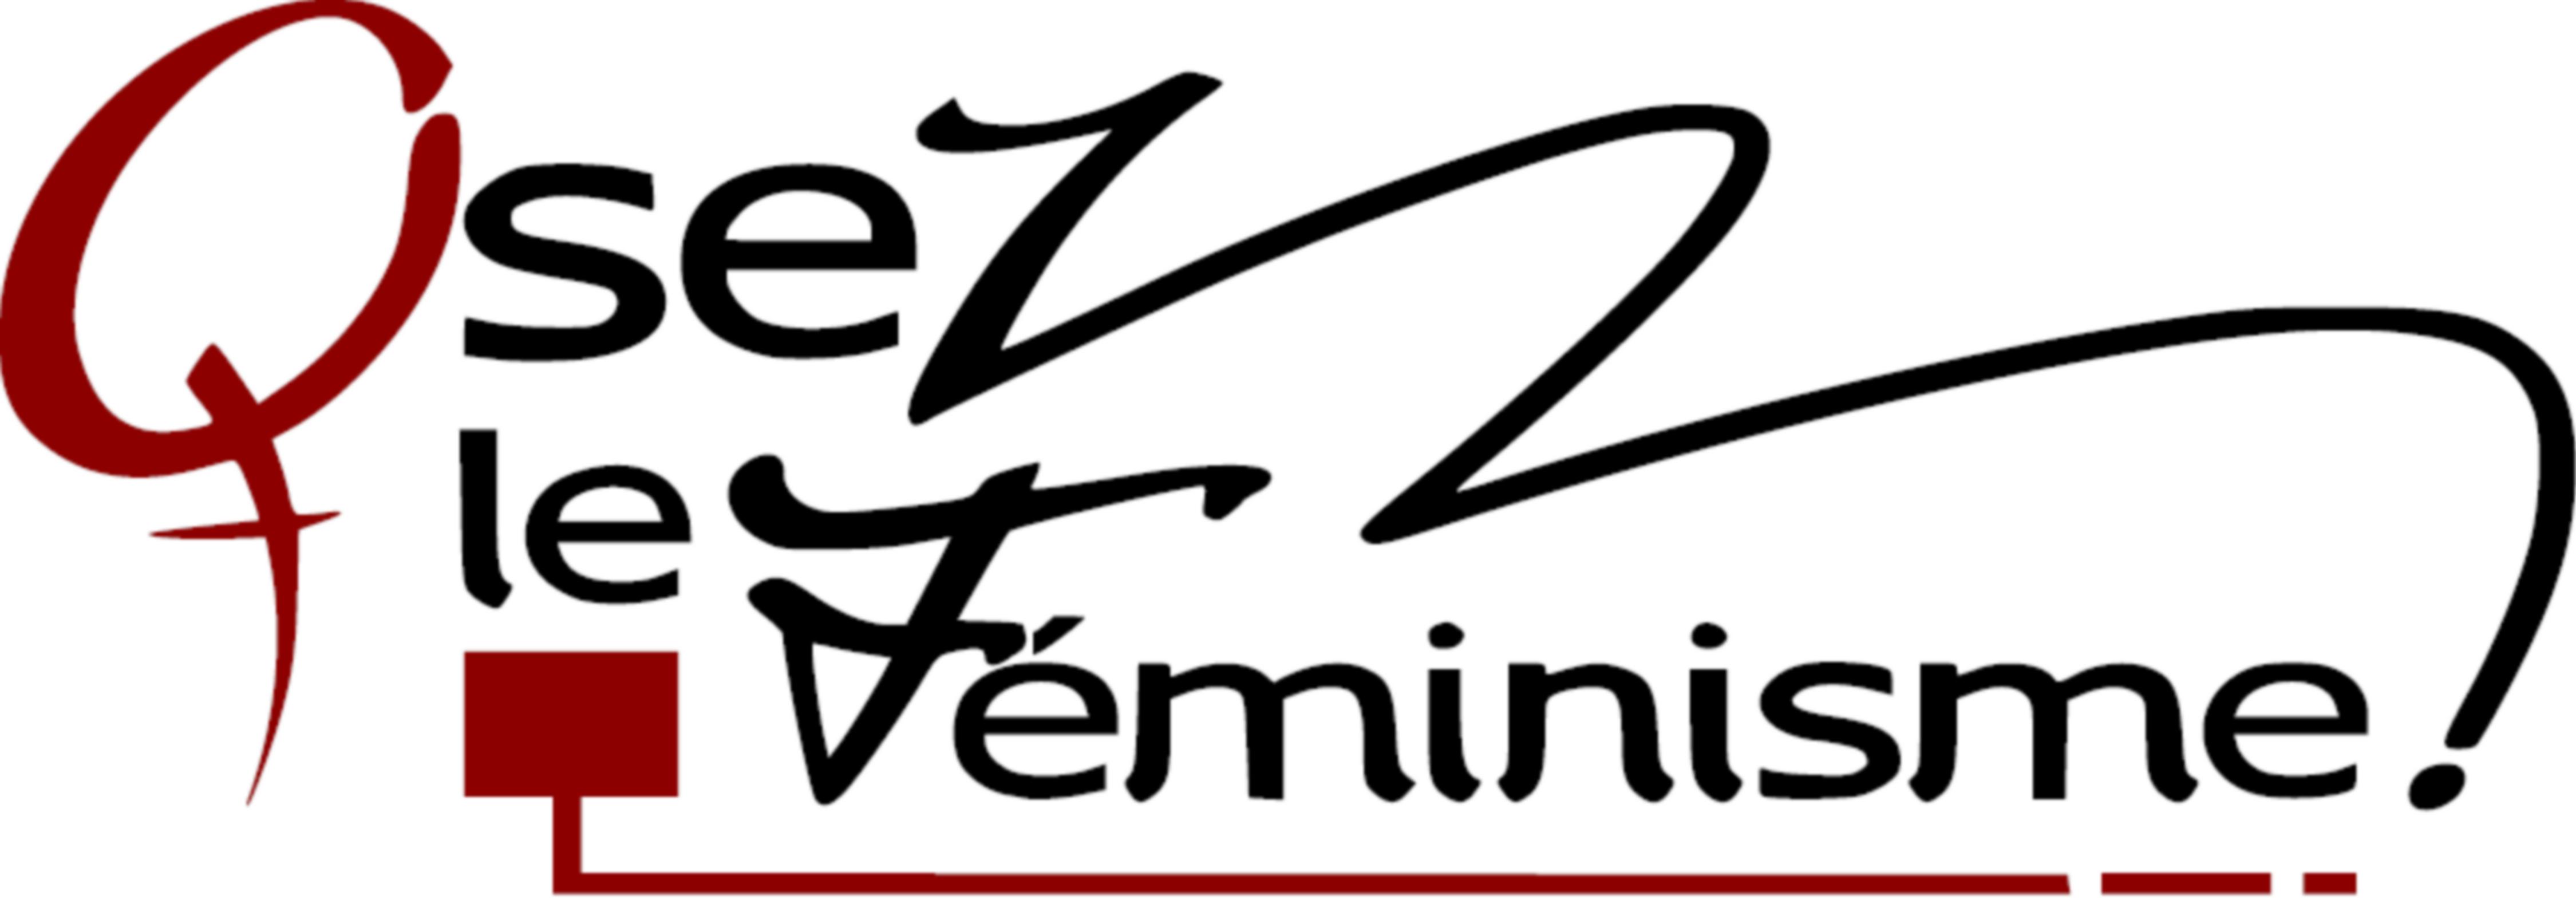 Resultado de imagen de Le féminisme